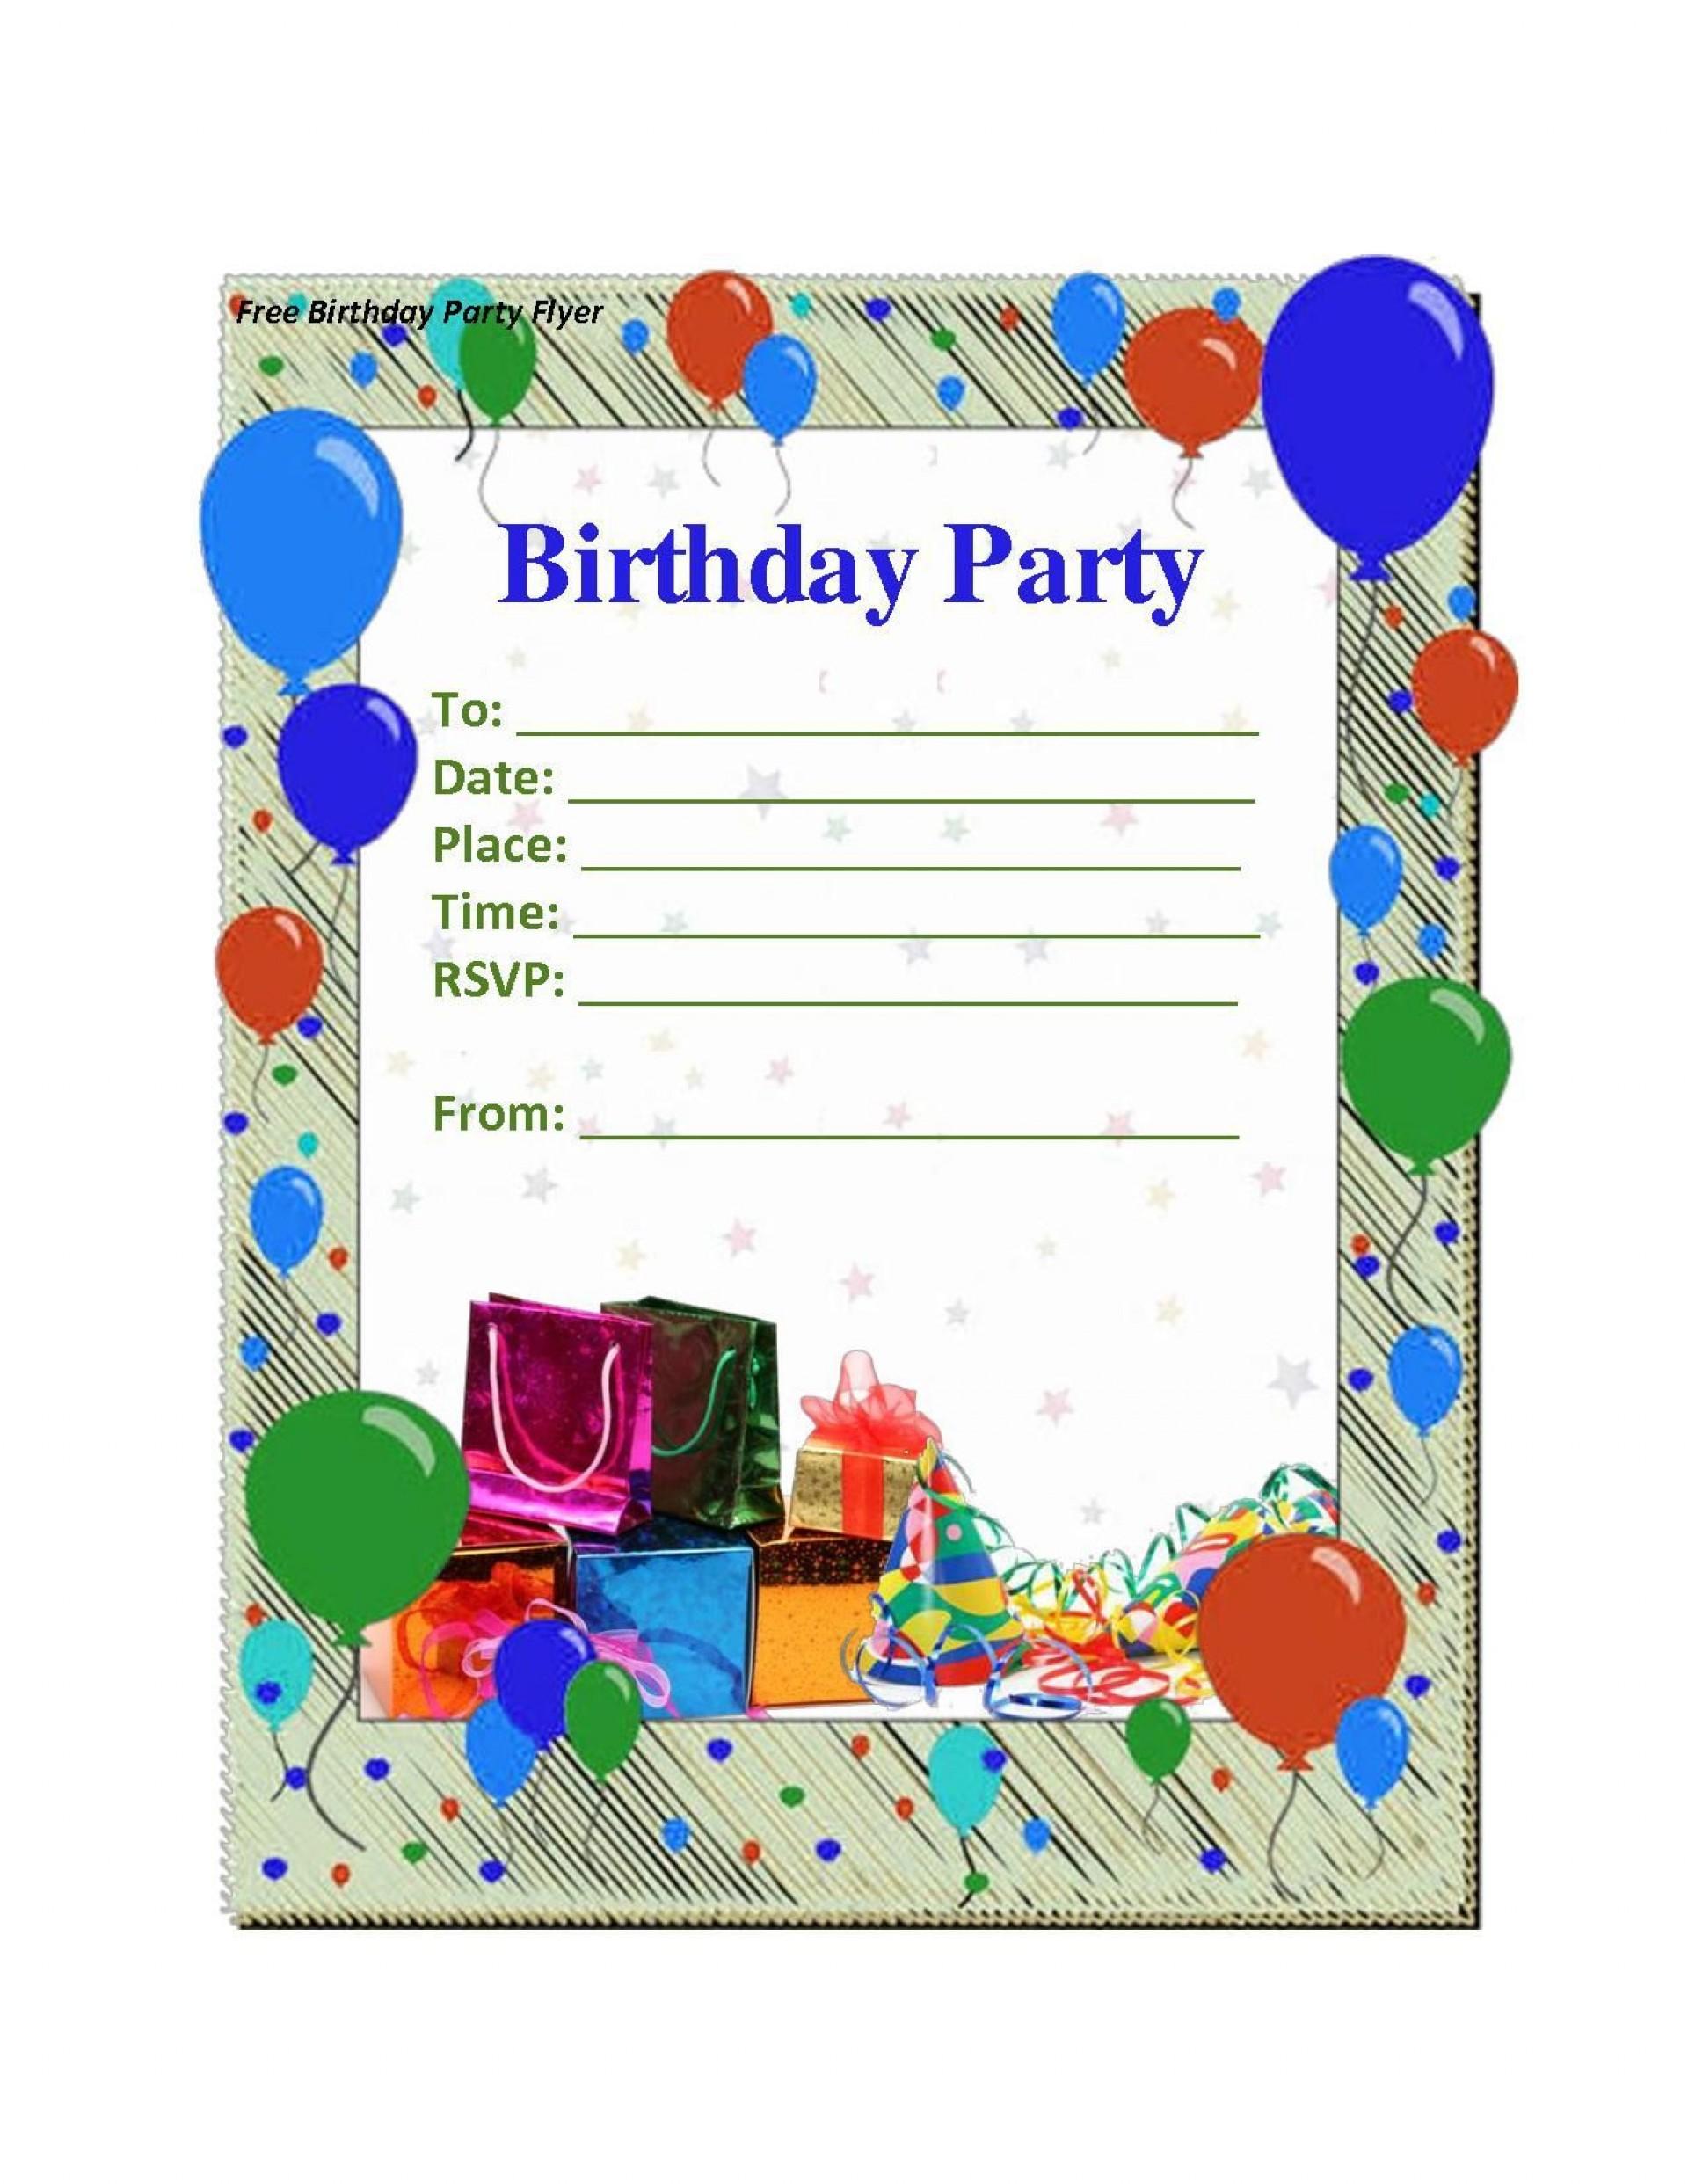 005 Dreaded Free Online Birthday Invitation Maker Printable Highest Clarity  1st Card1920